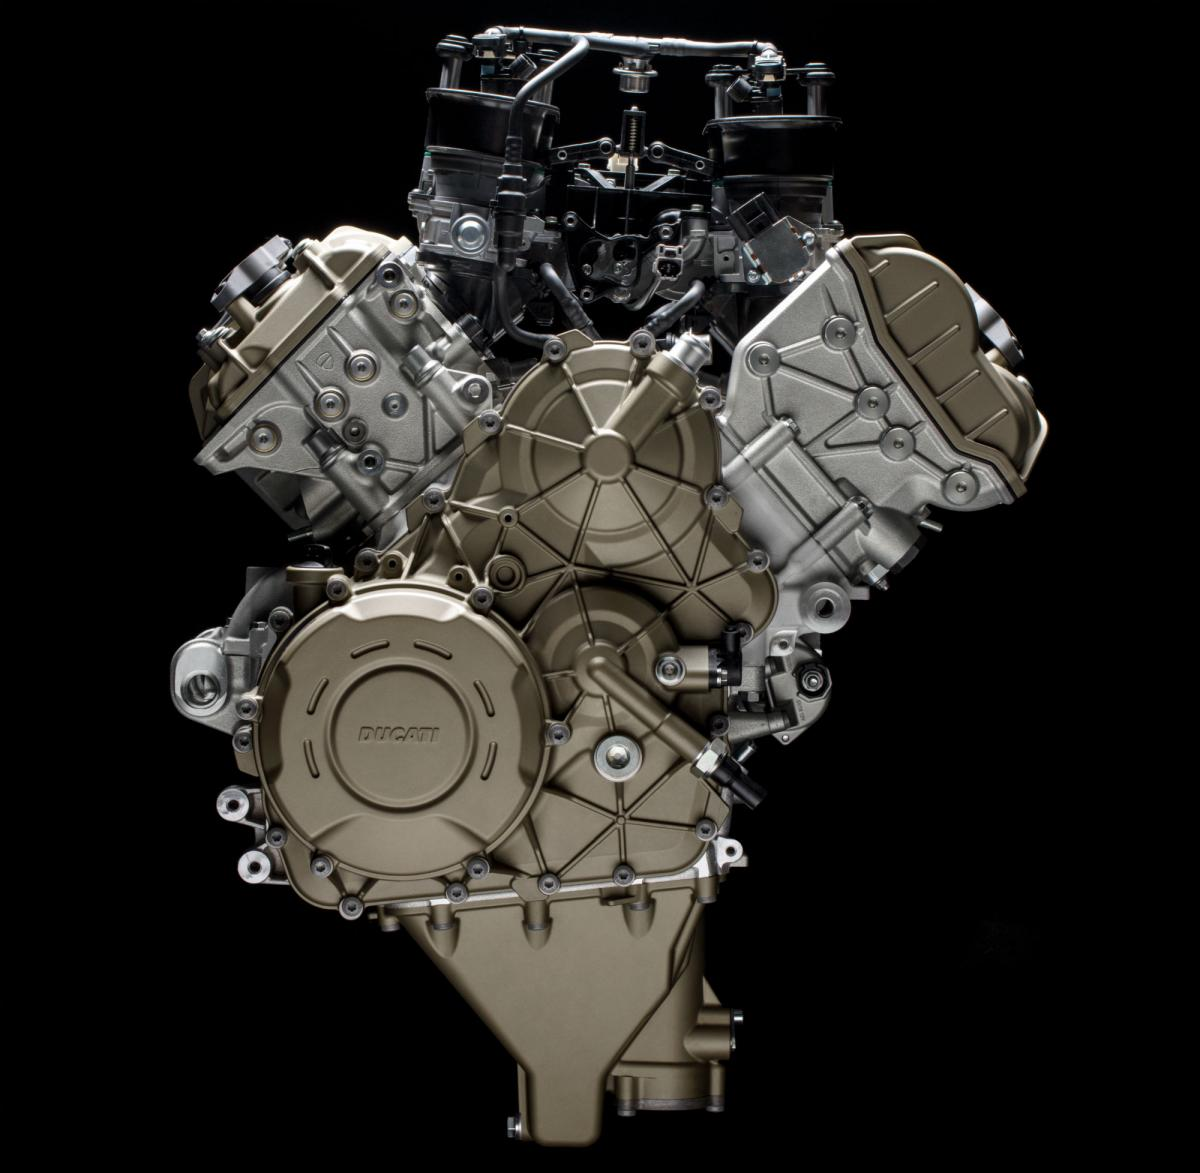 Ducati Desmosedici Stradale V4 unveiled